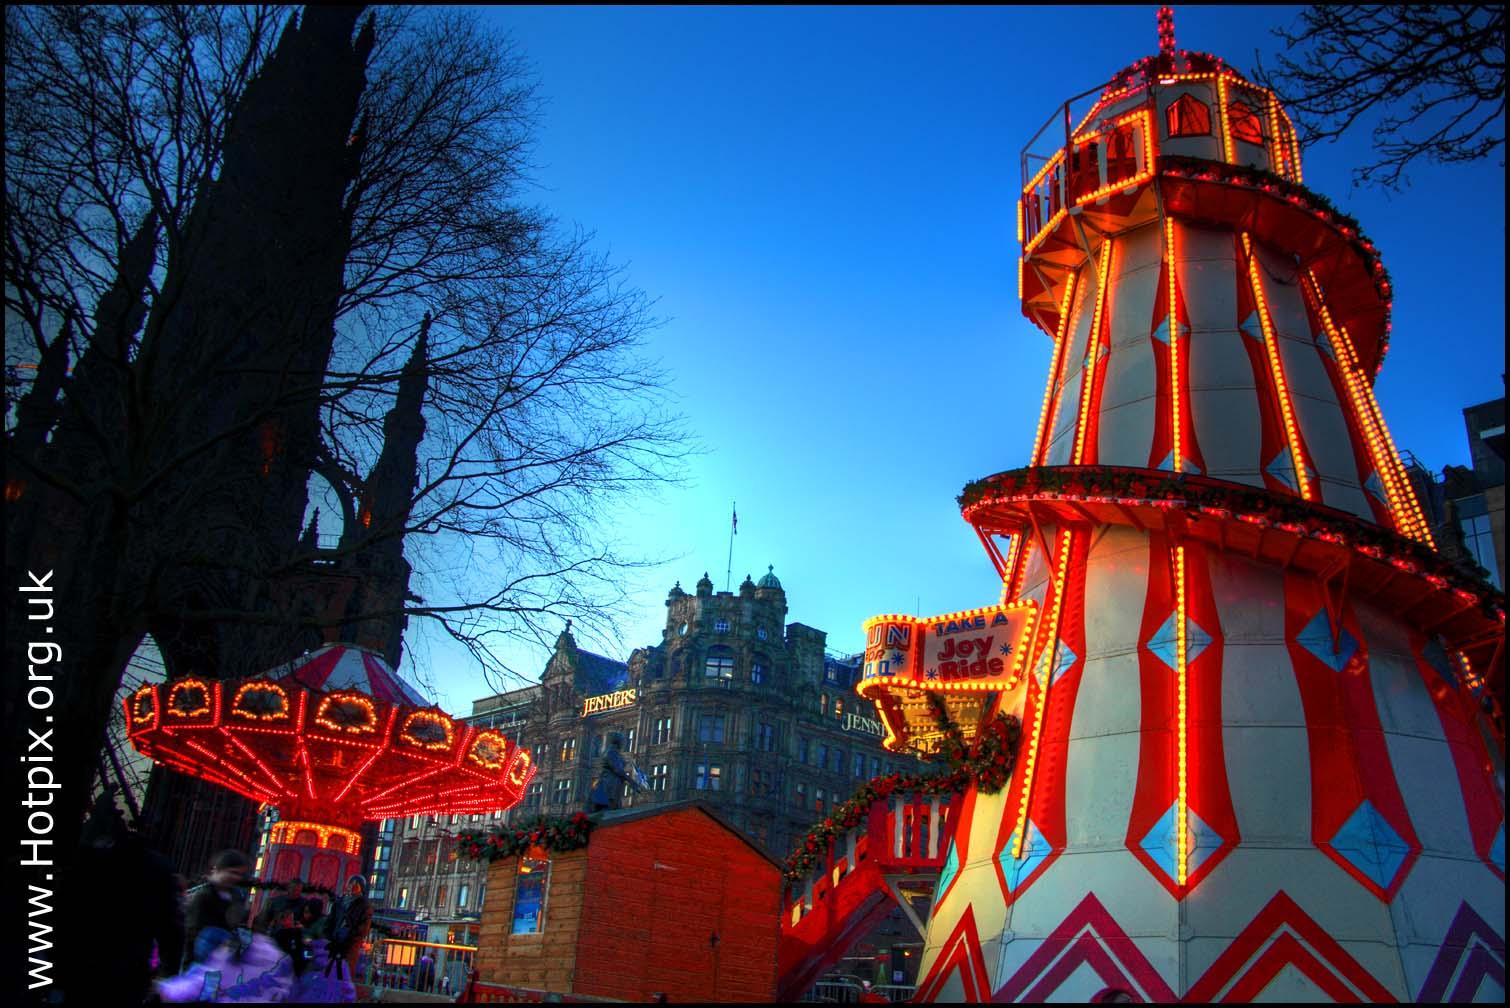 dusk,night,shot,tripod,edinburgh,scotland,fair,fayre,princes,street,st,gardens,xmas,christmas,jenners,store,department,shop,shopping,tourist,travel,UK,britain,winter,december,hogmanay,scottish,scots,escotia,neon,lights,bright,highway,road,light,stream,lightstream,edinbrugh,hotpix!,Edinburg,#tonysmith,#tonysmithhotpix,edimburgh